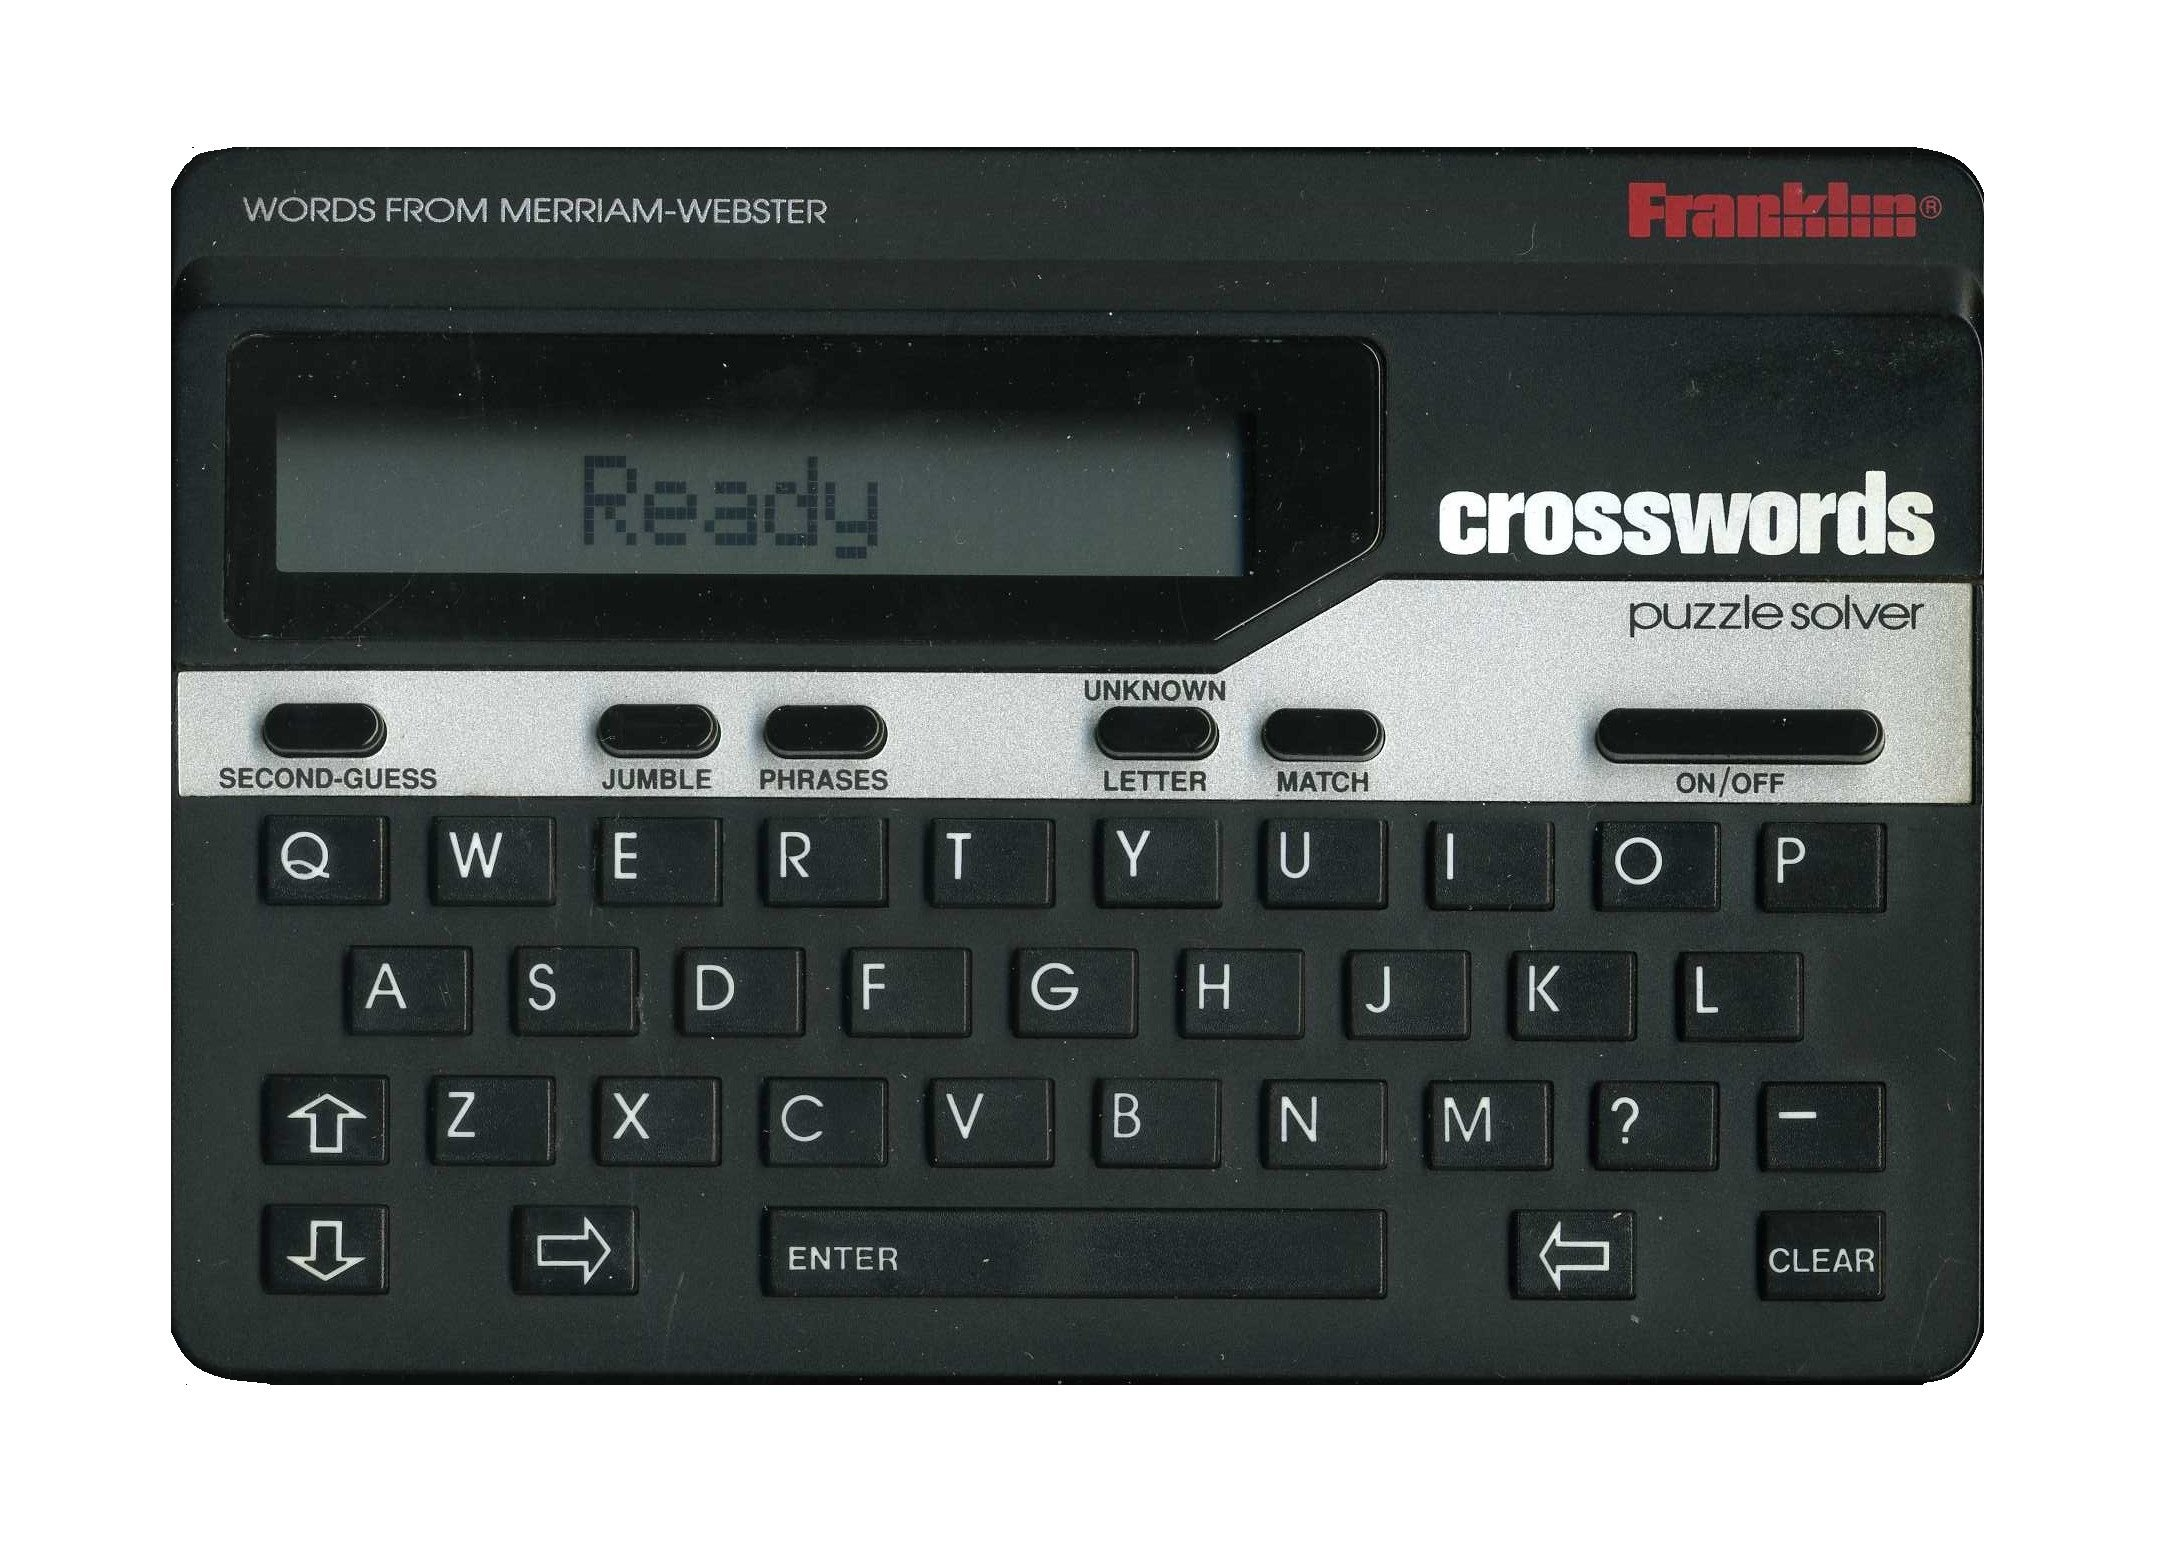 franklin crosswords puzzle solver cw 50 merriam webster